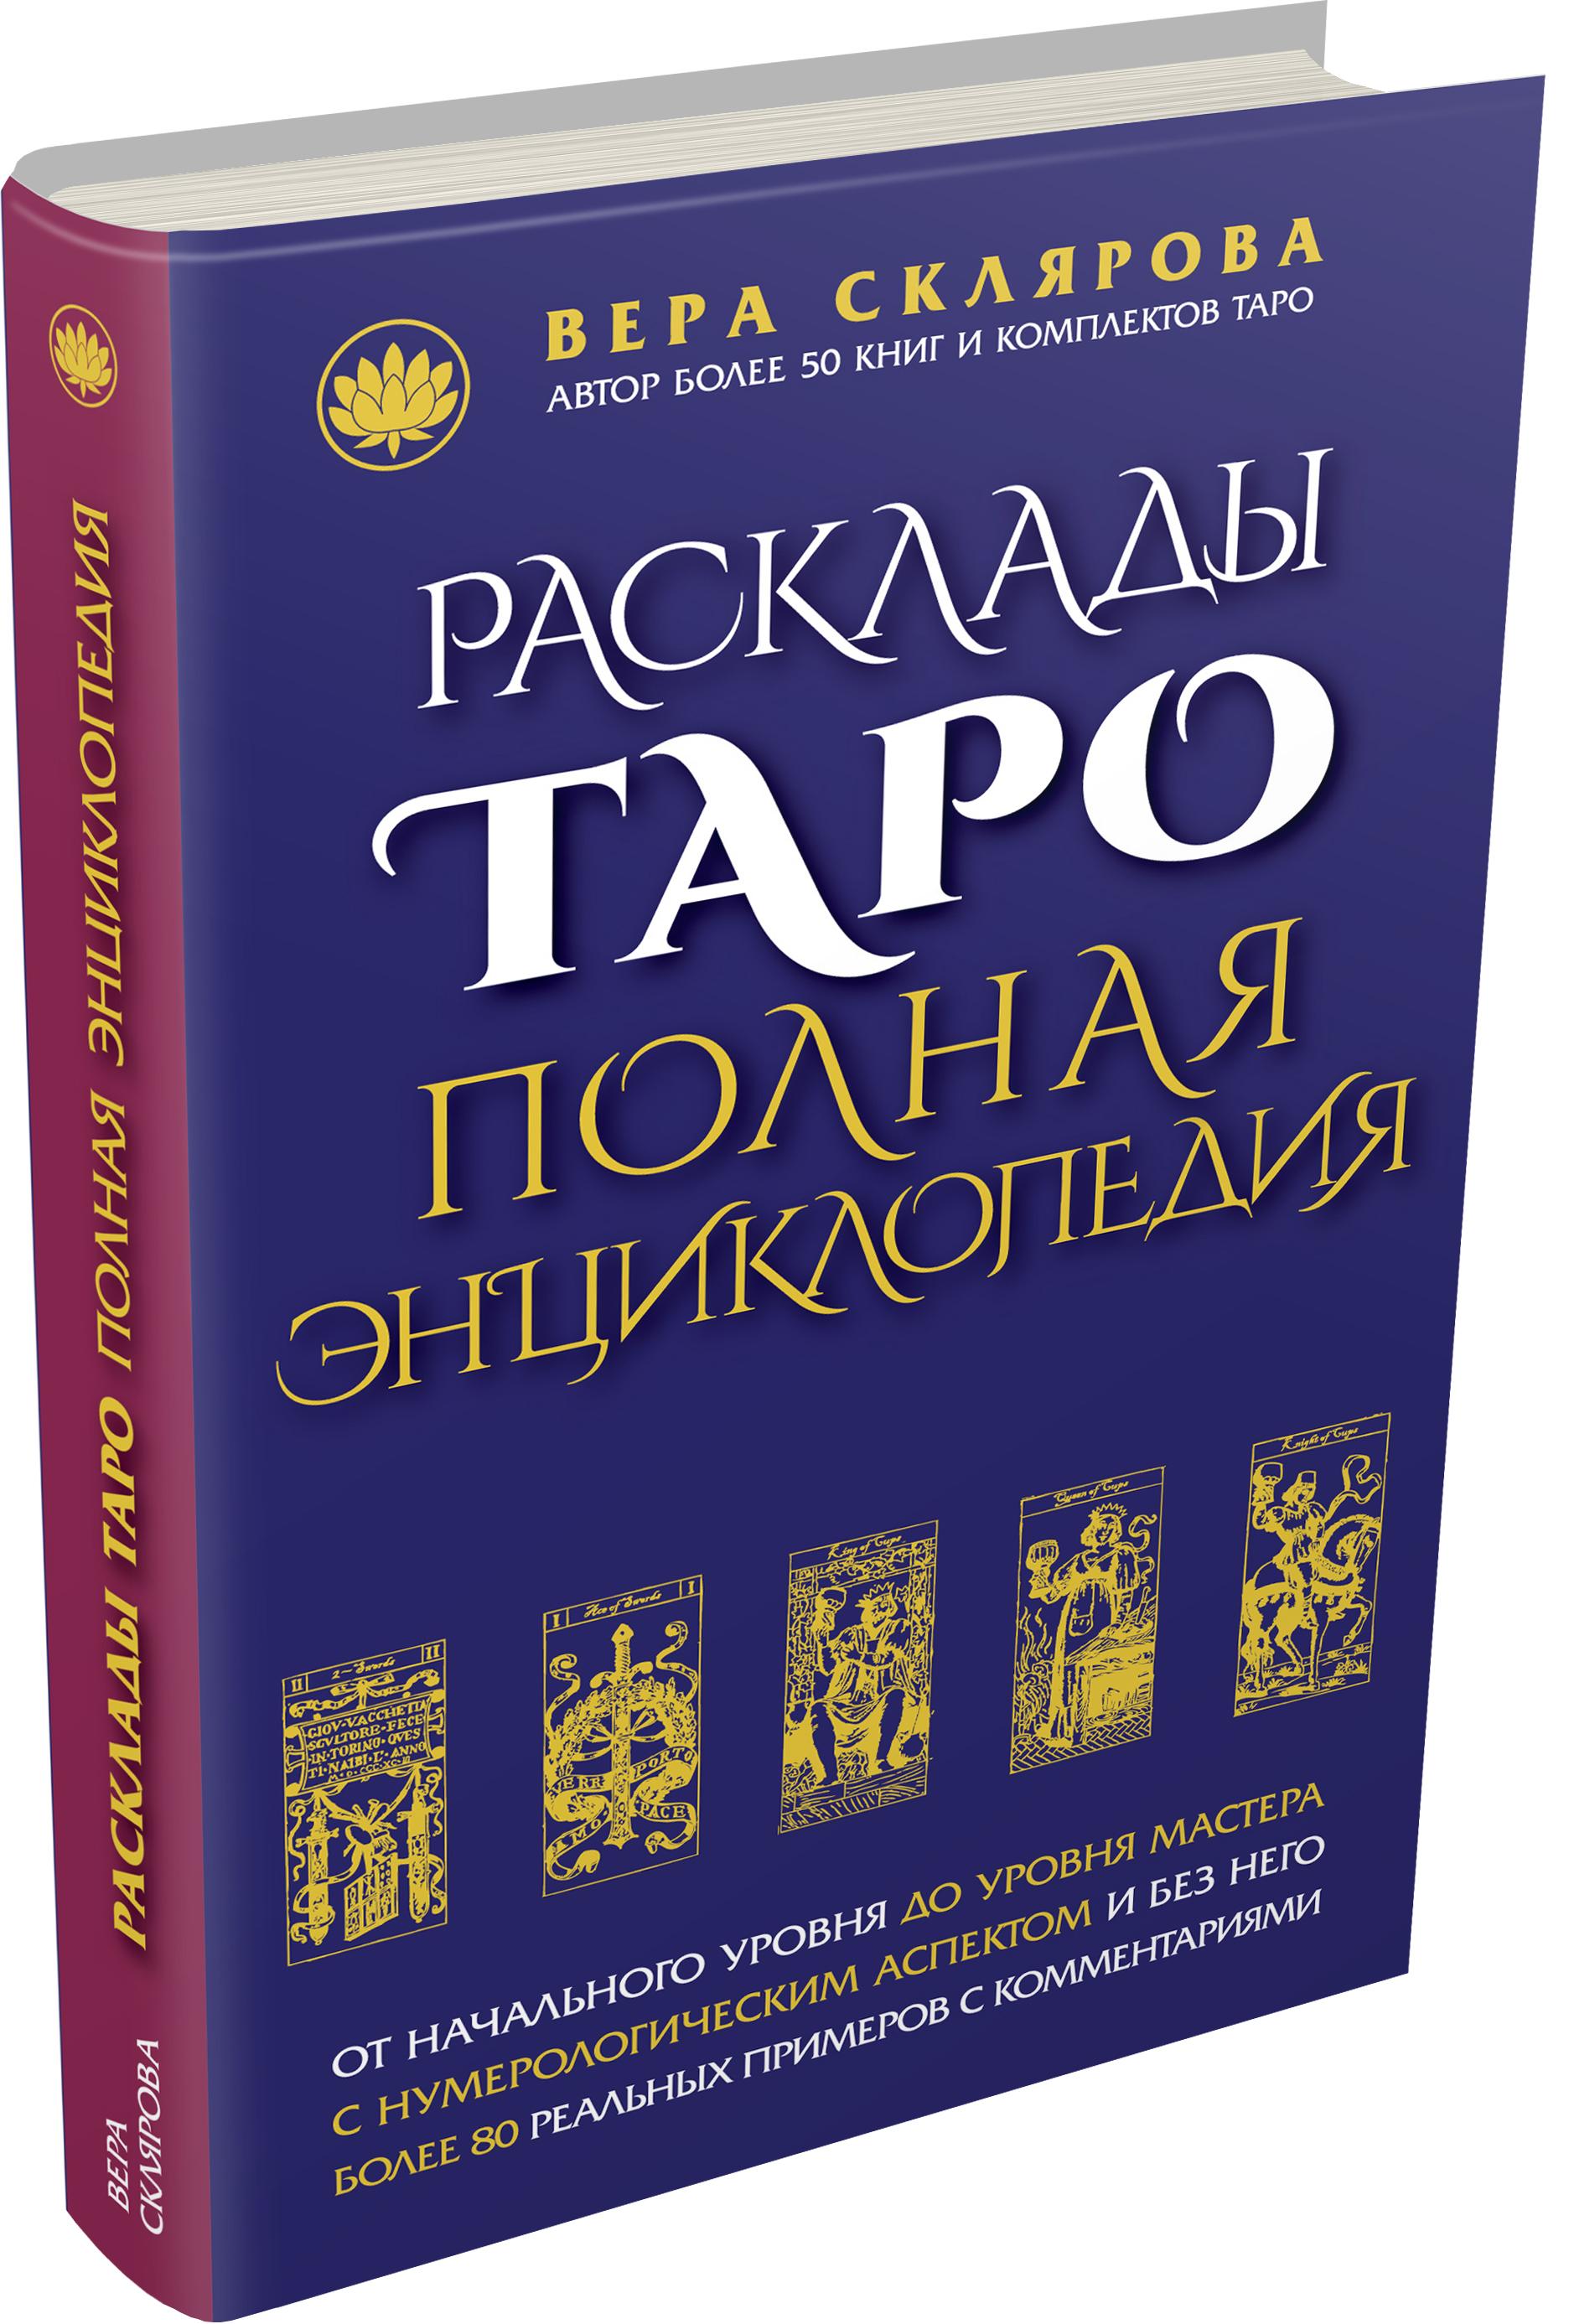 Вера Склярова Расклады ТАРО. Полная энциклопедия (синяя)